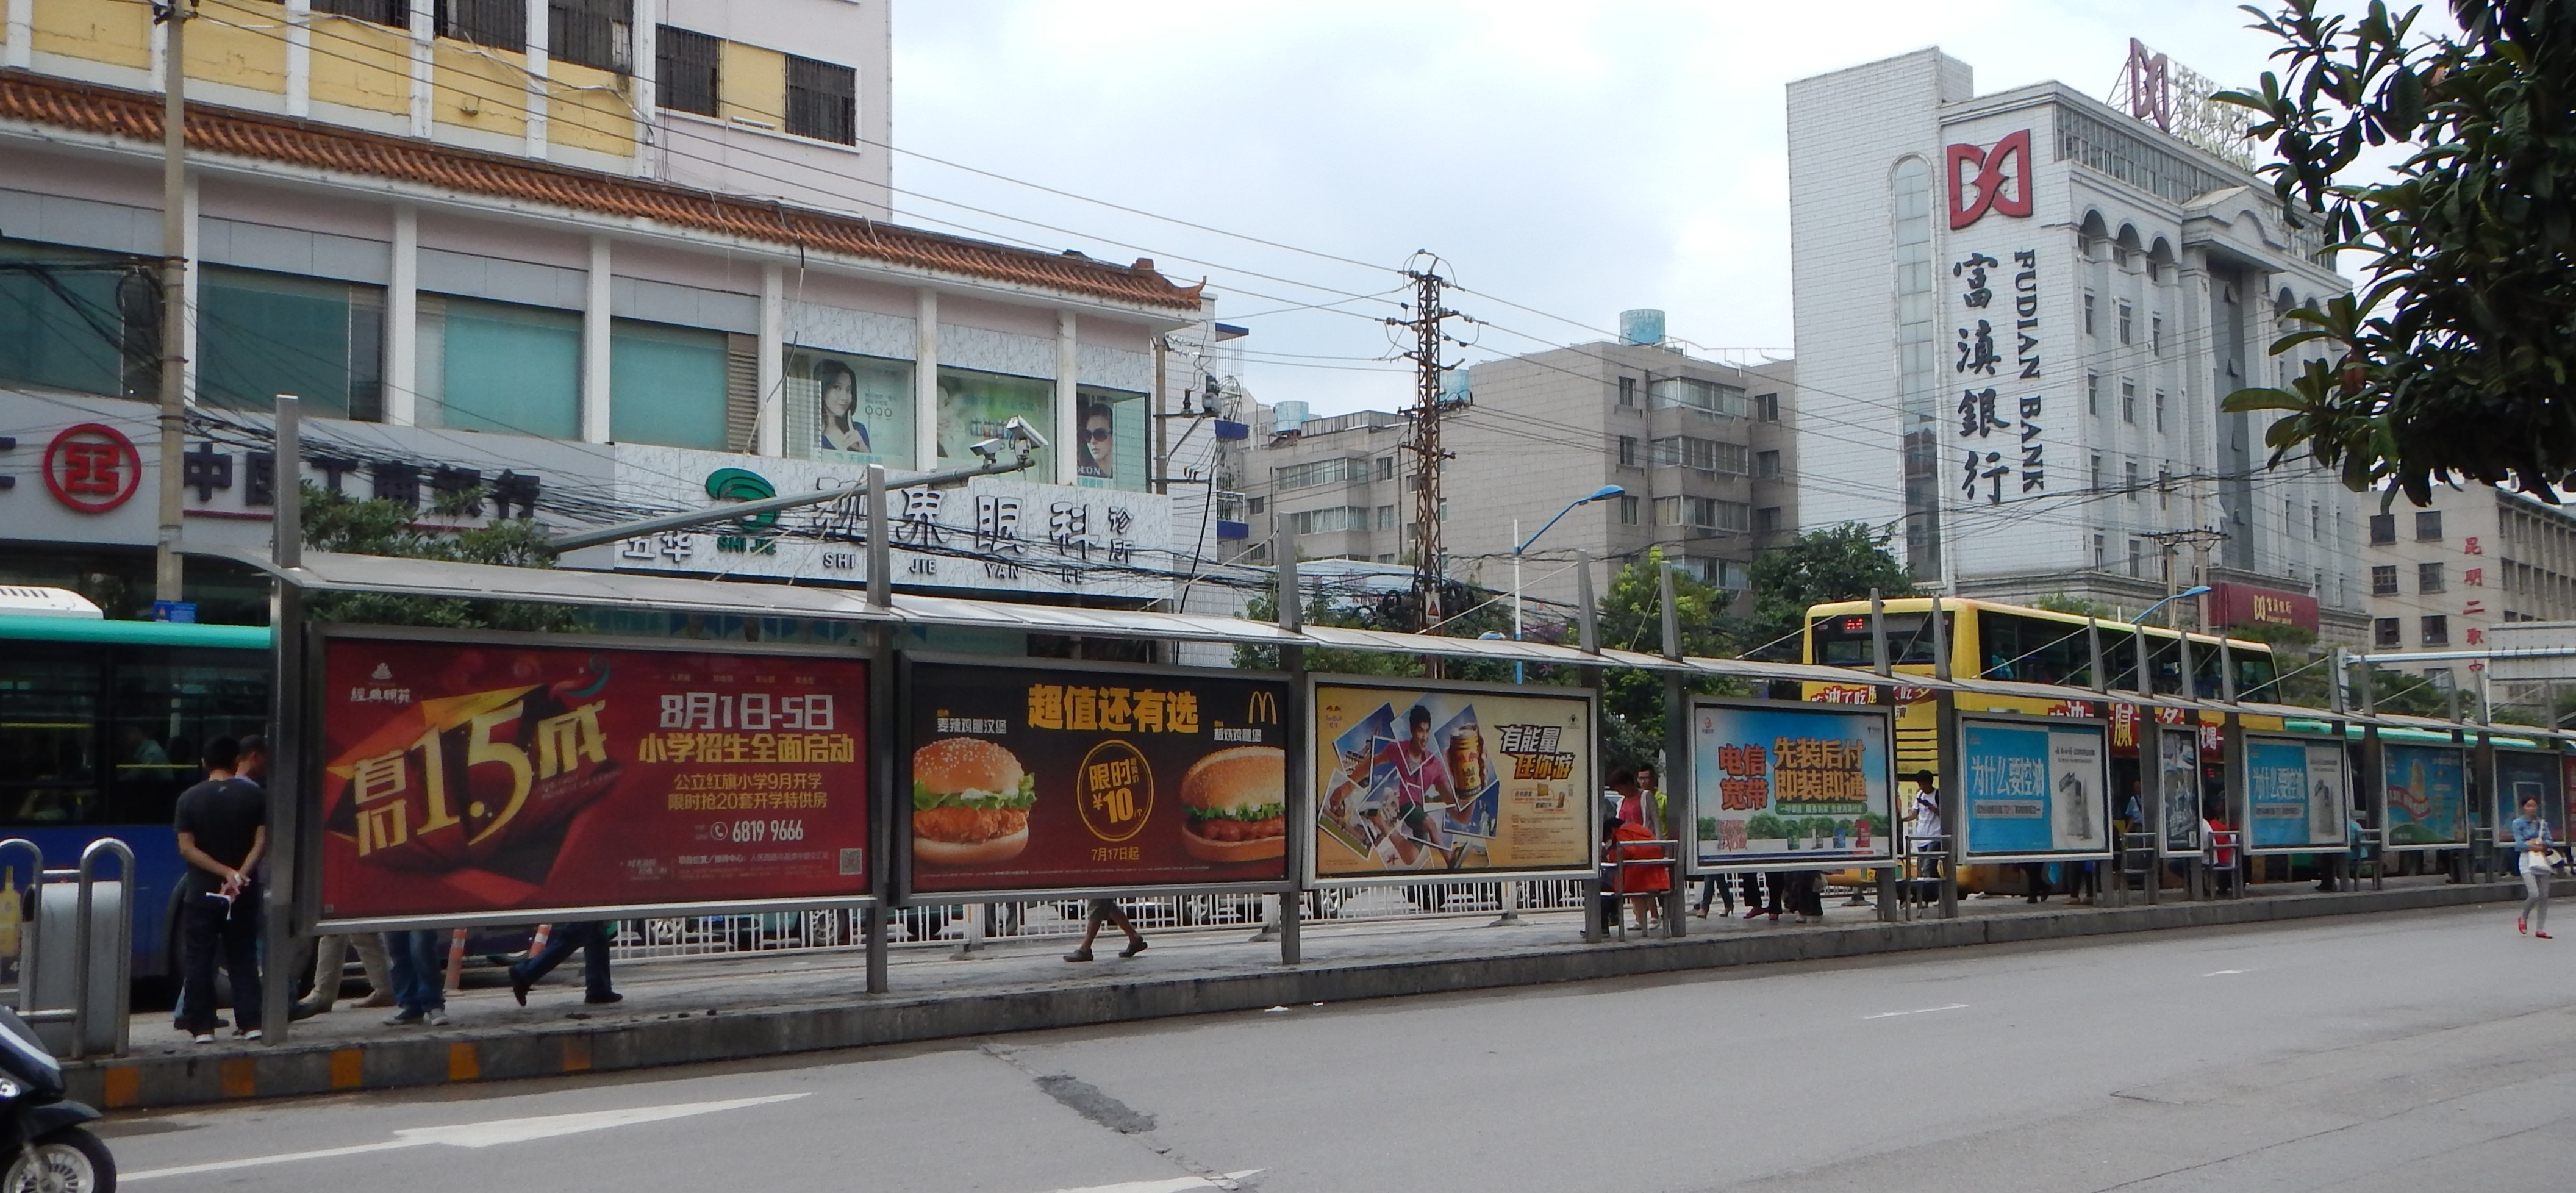 05 Kunming 258 Pel centre 9